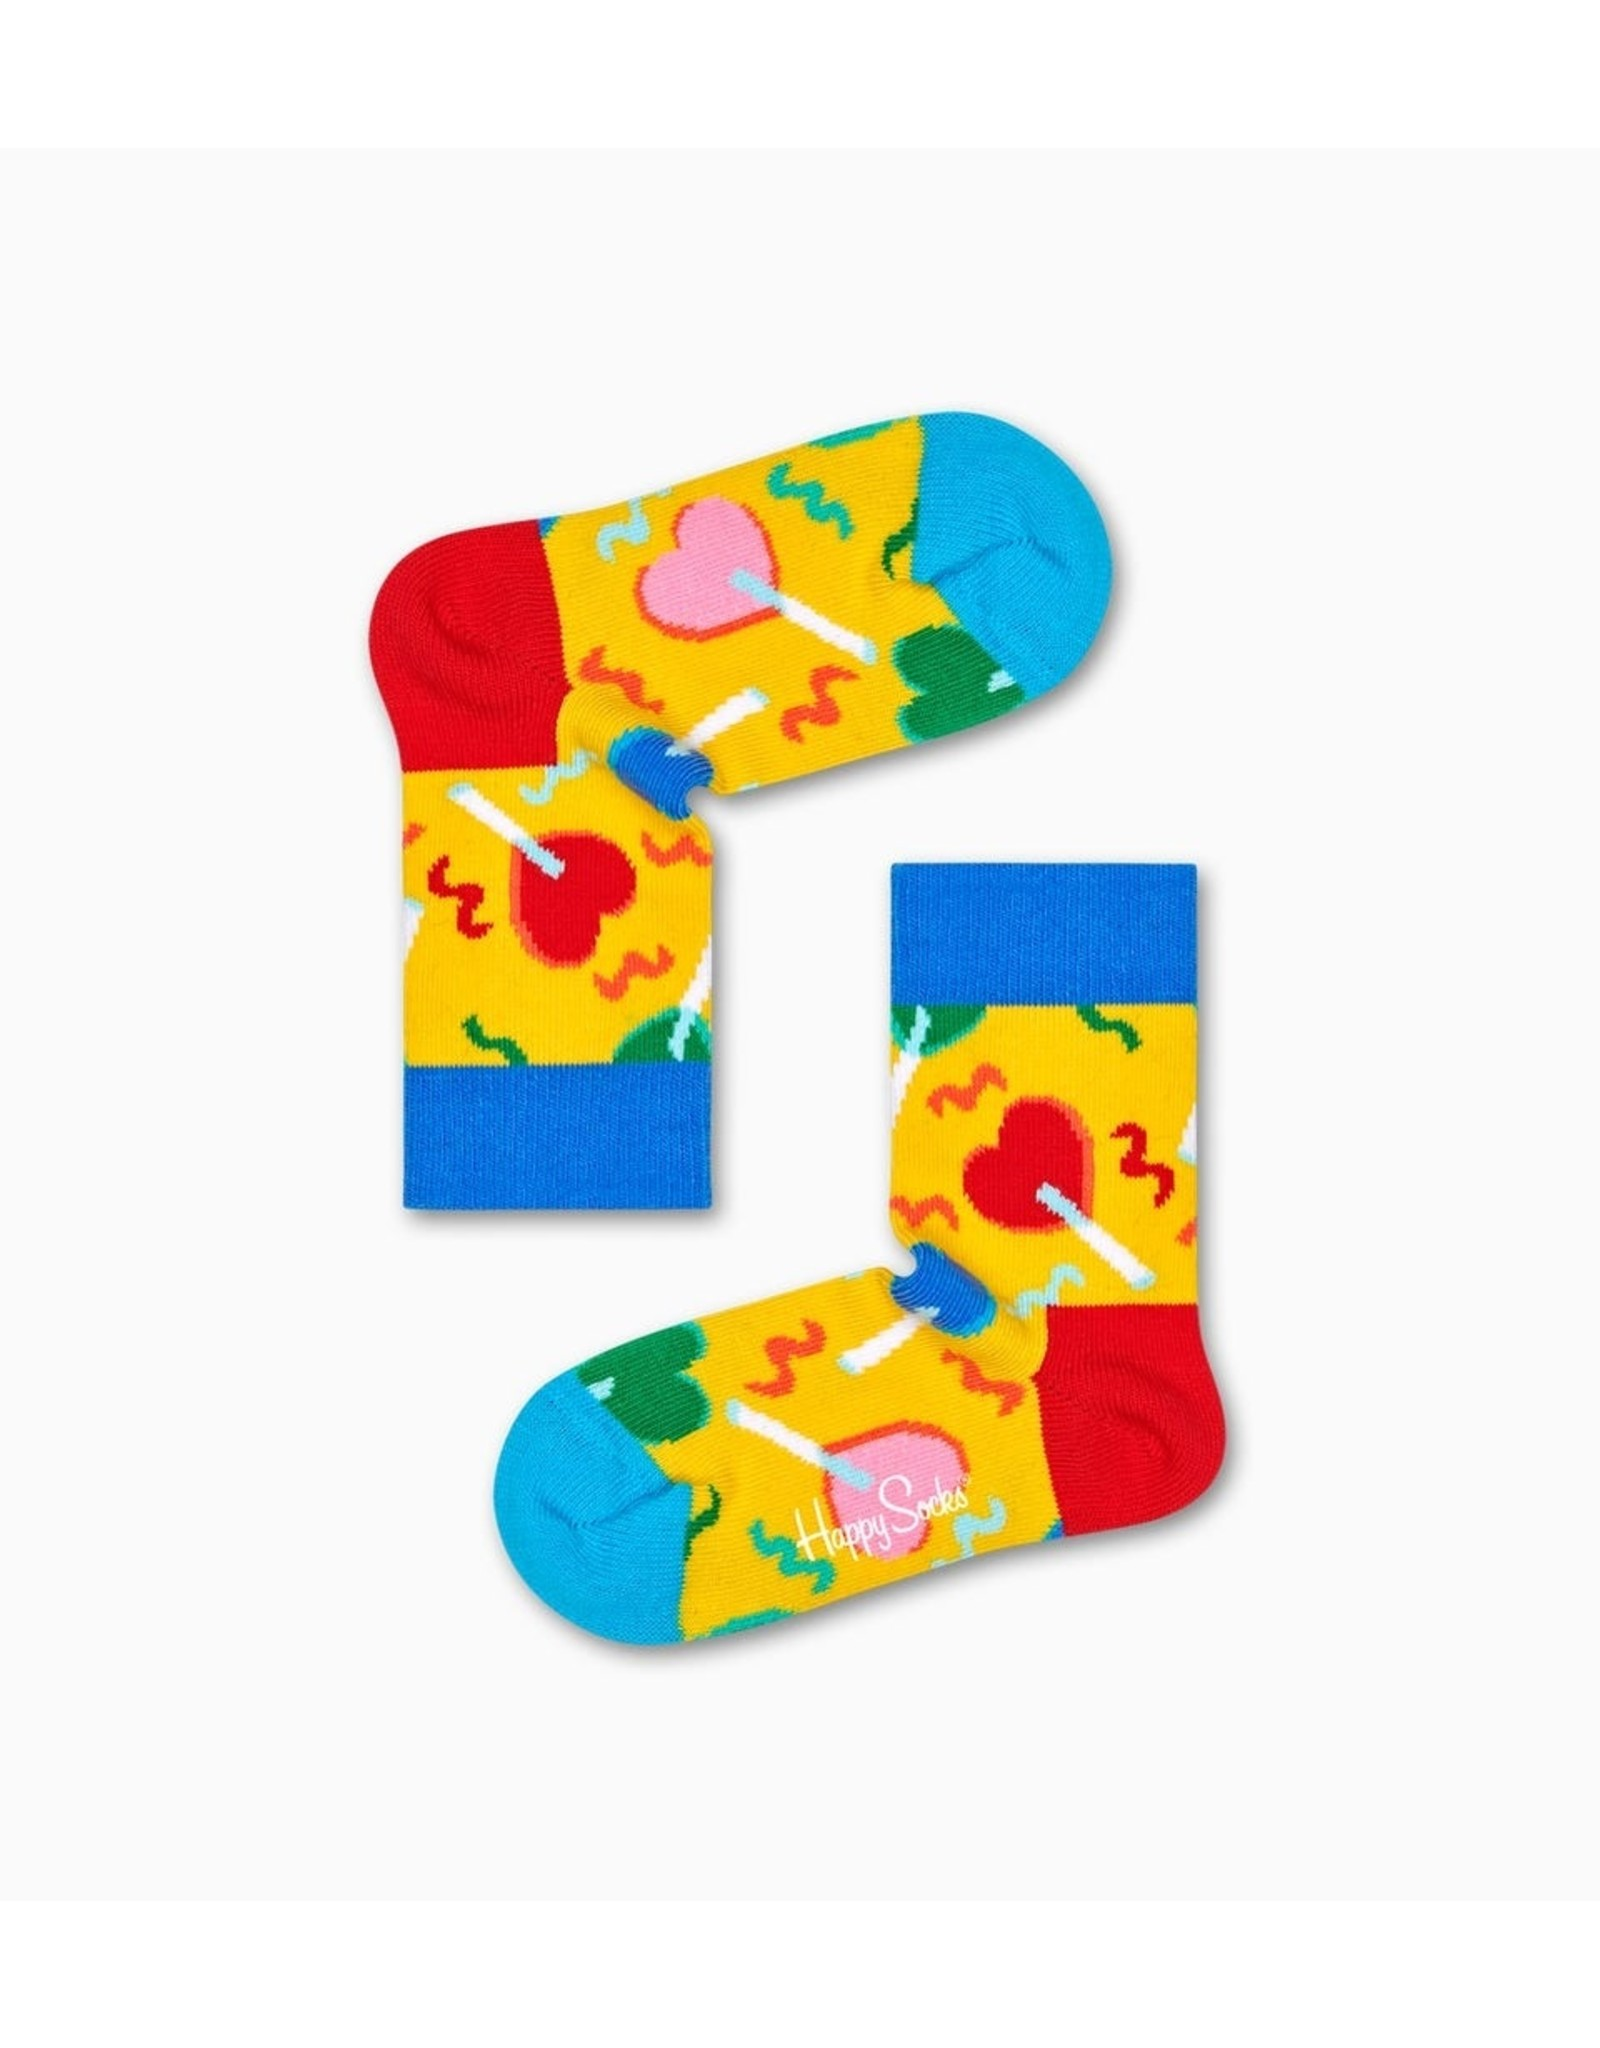 Happy Socks Kindersokken met hartjes lolly's